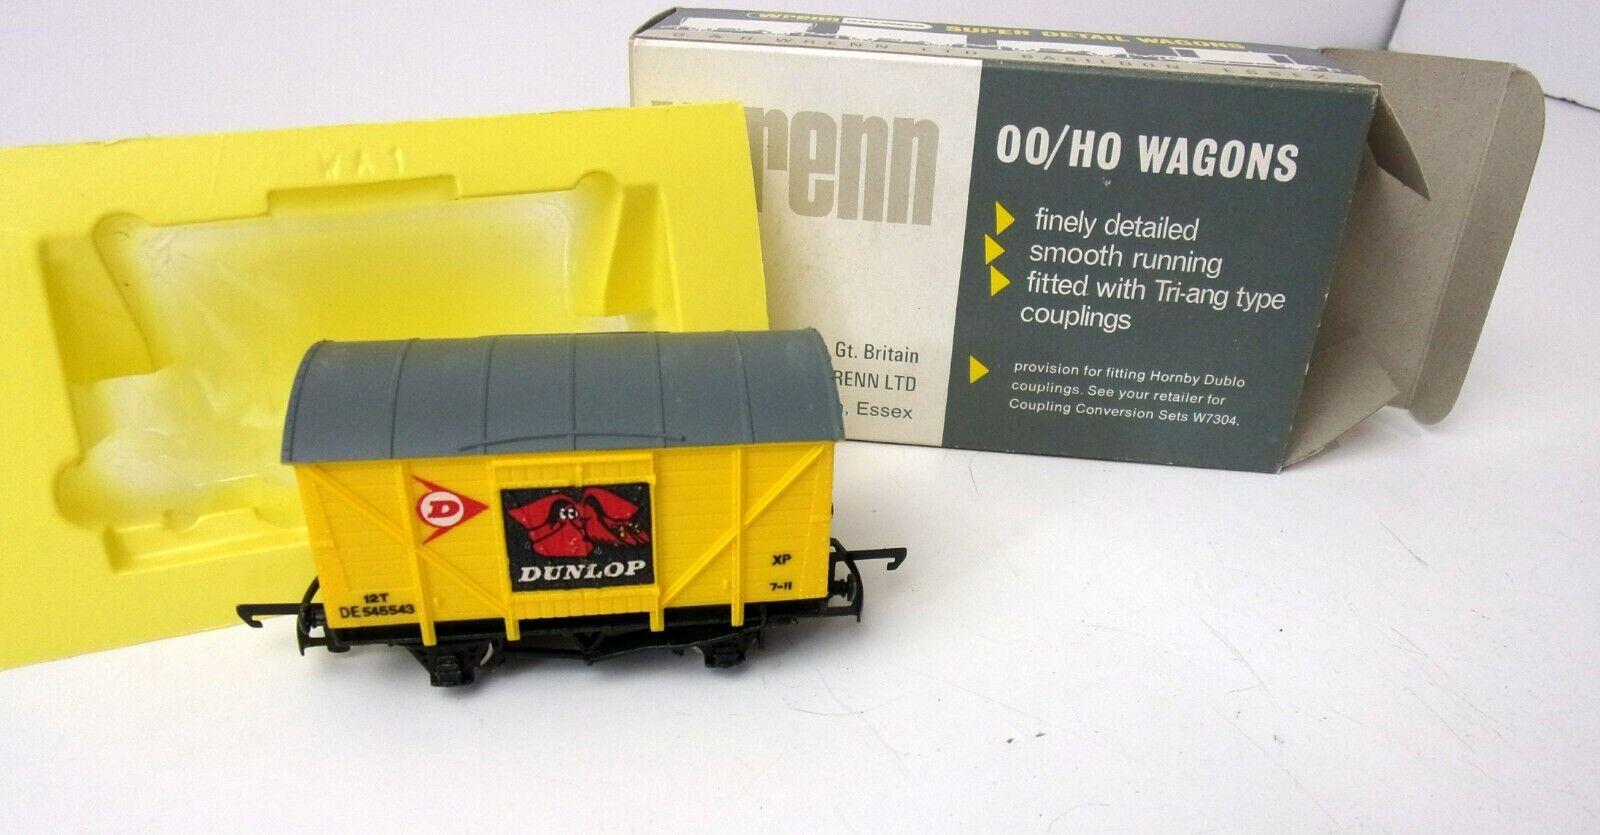 Wrenn Railways W5004 Ventilated Van DUNLOP DE545543 dark amarillo P4 box OO HO